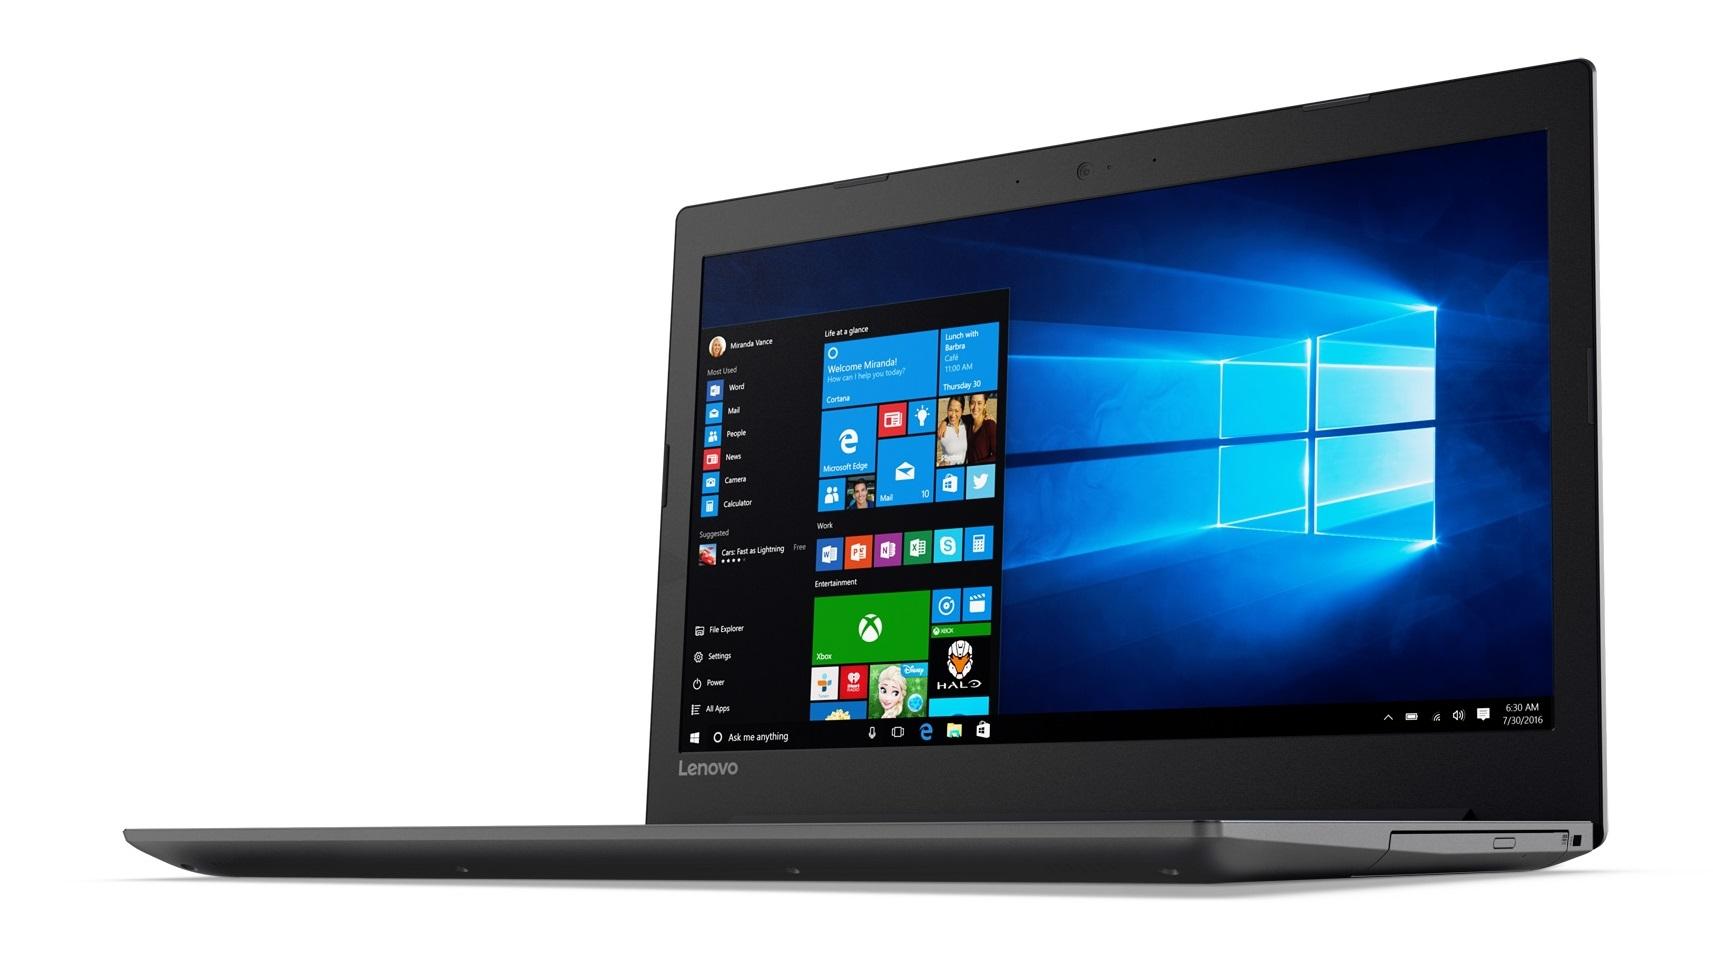 Фото  Ноутбук Lenovo ideapad 320-15IKB Onyx Black (80XL041TRA)